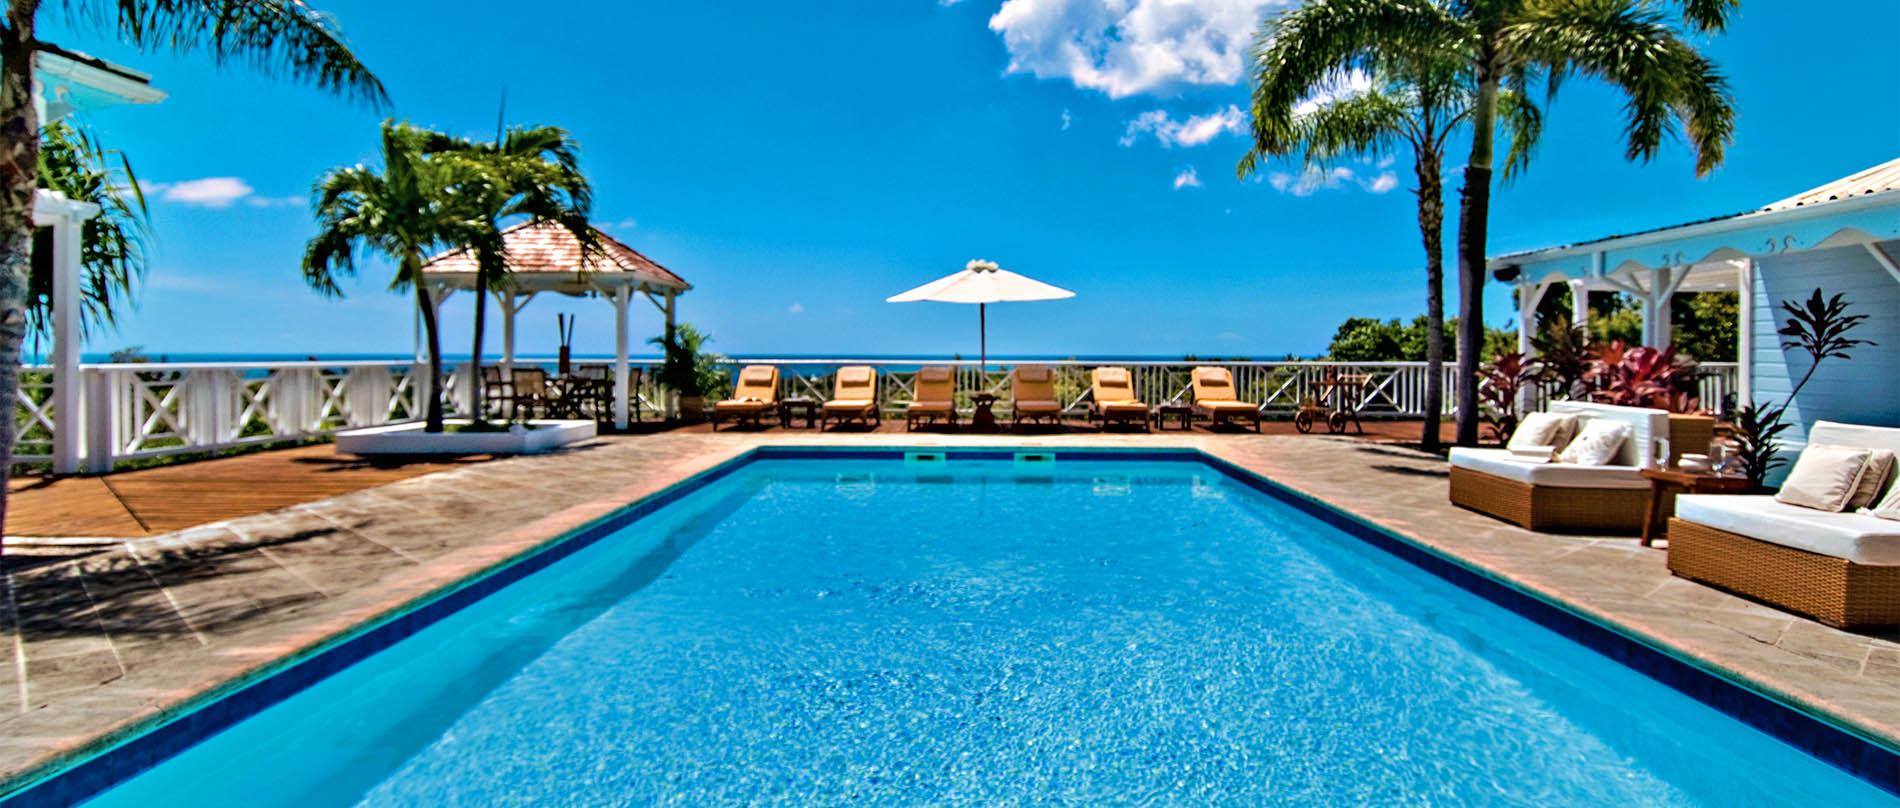 Hotel Caraibi Villasfwi